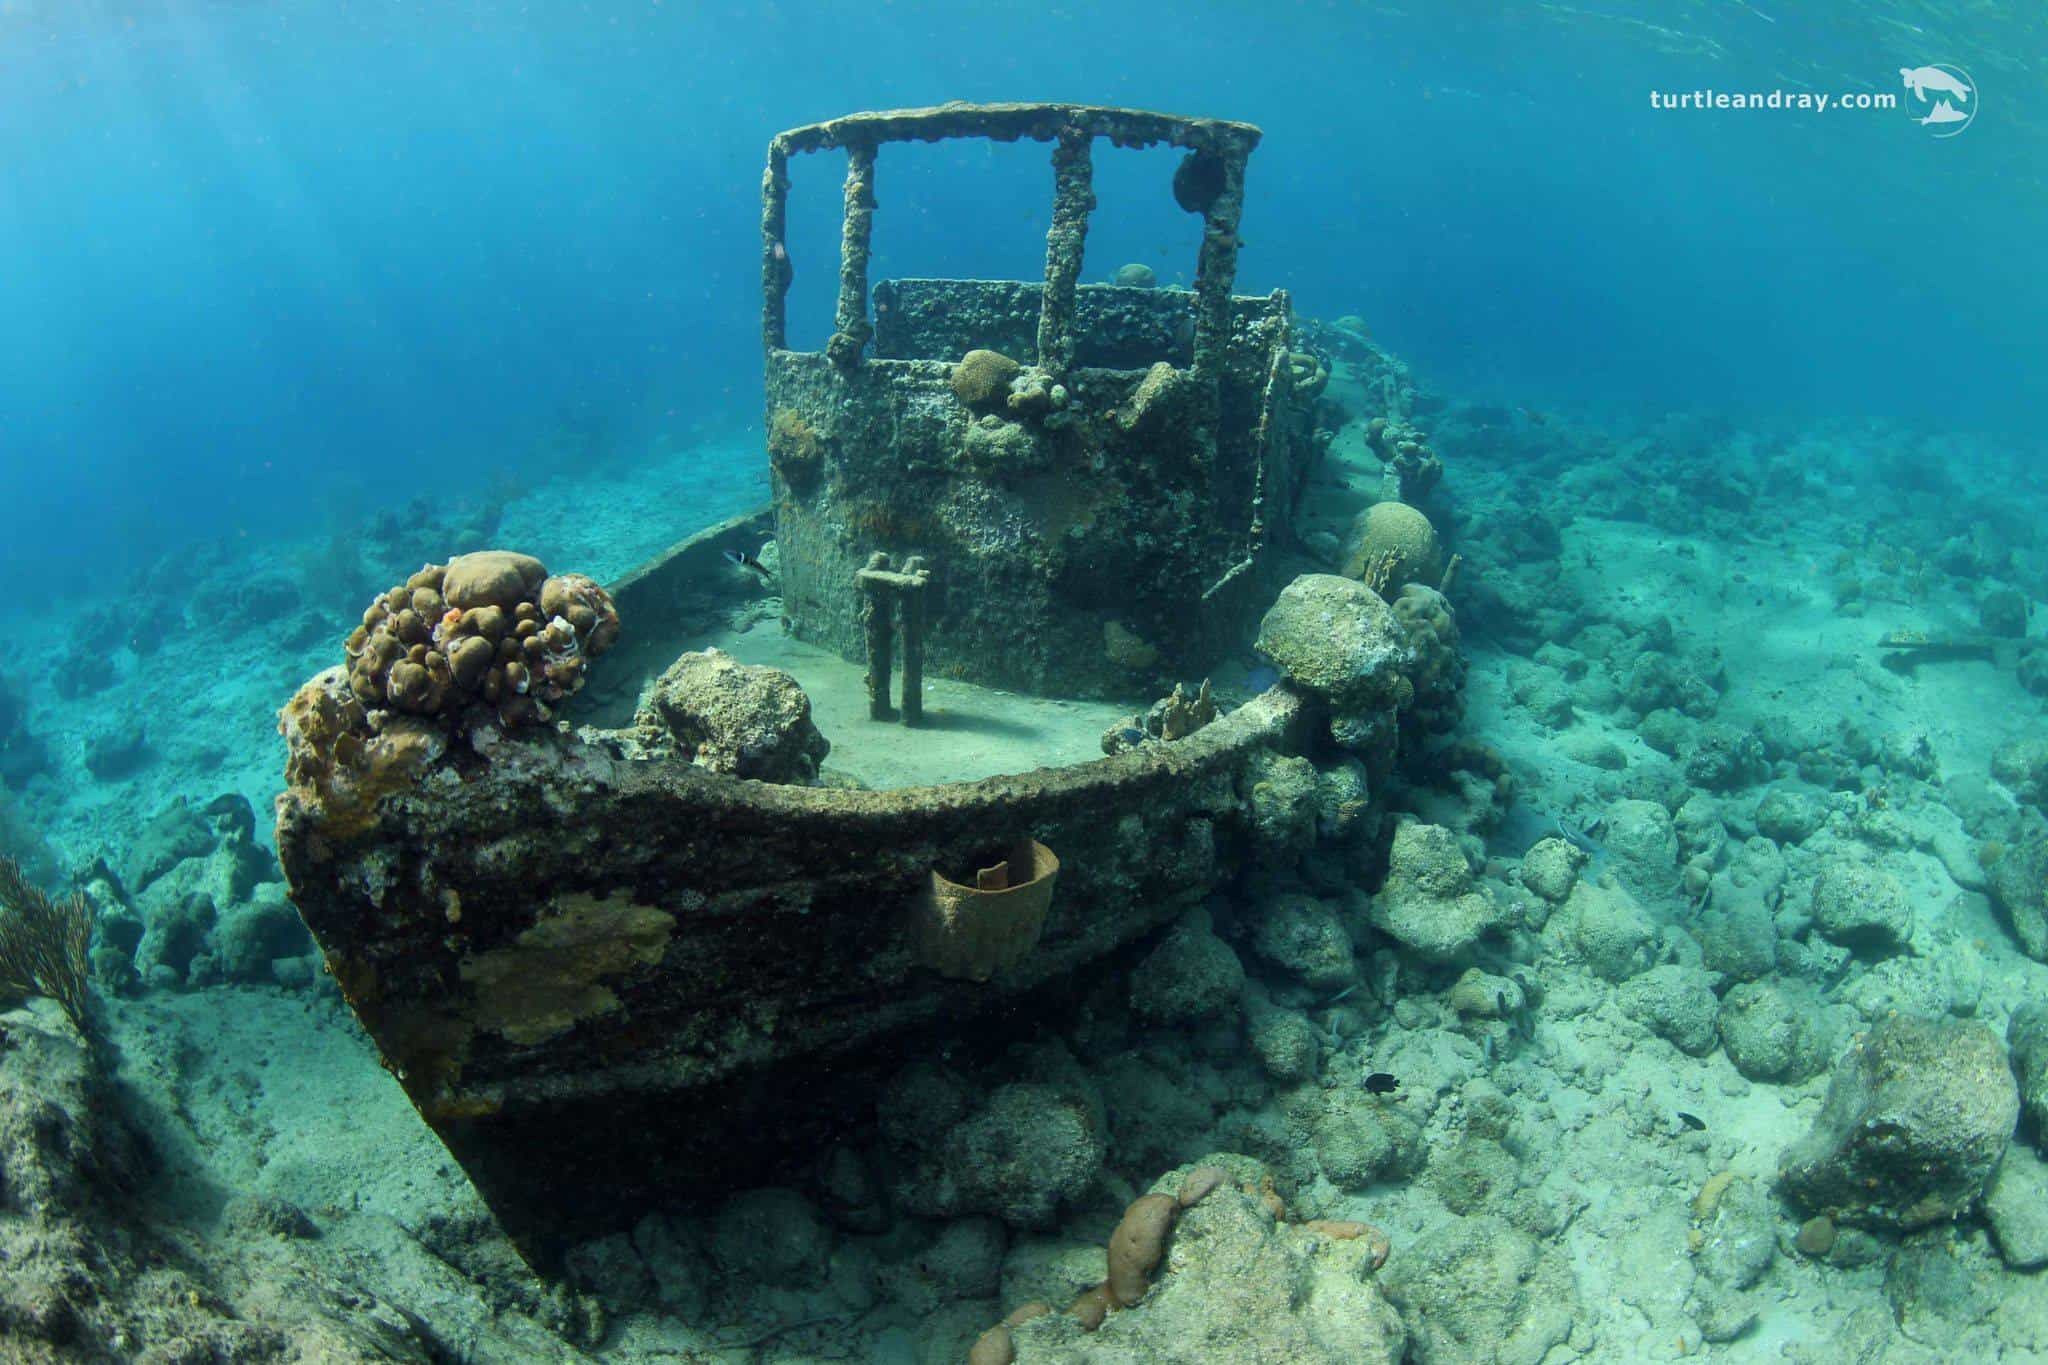 Catamaran BlueFinn Curacao Snorkeling Shipwreck Tugboat